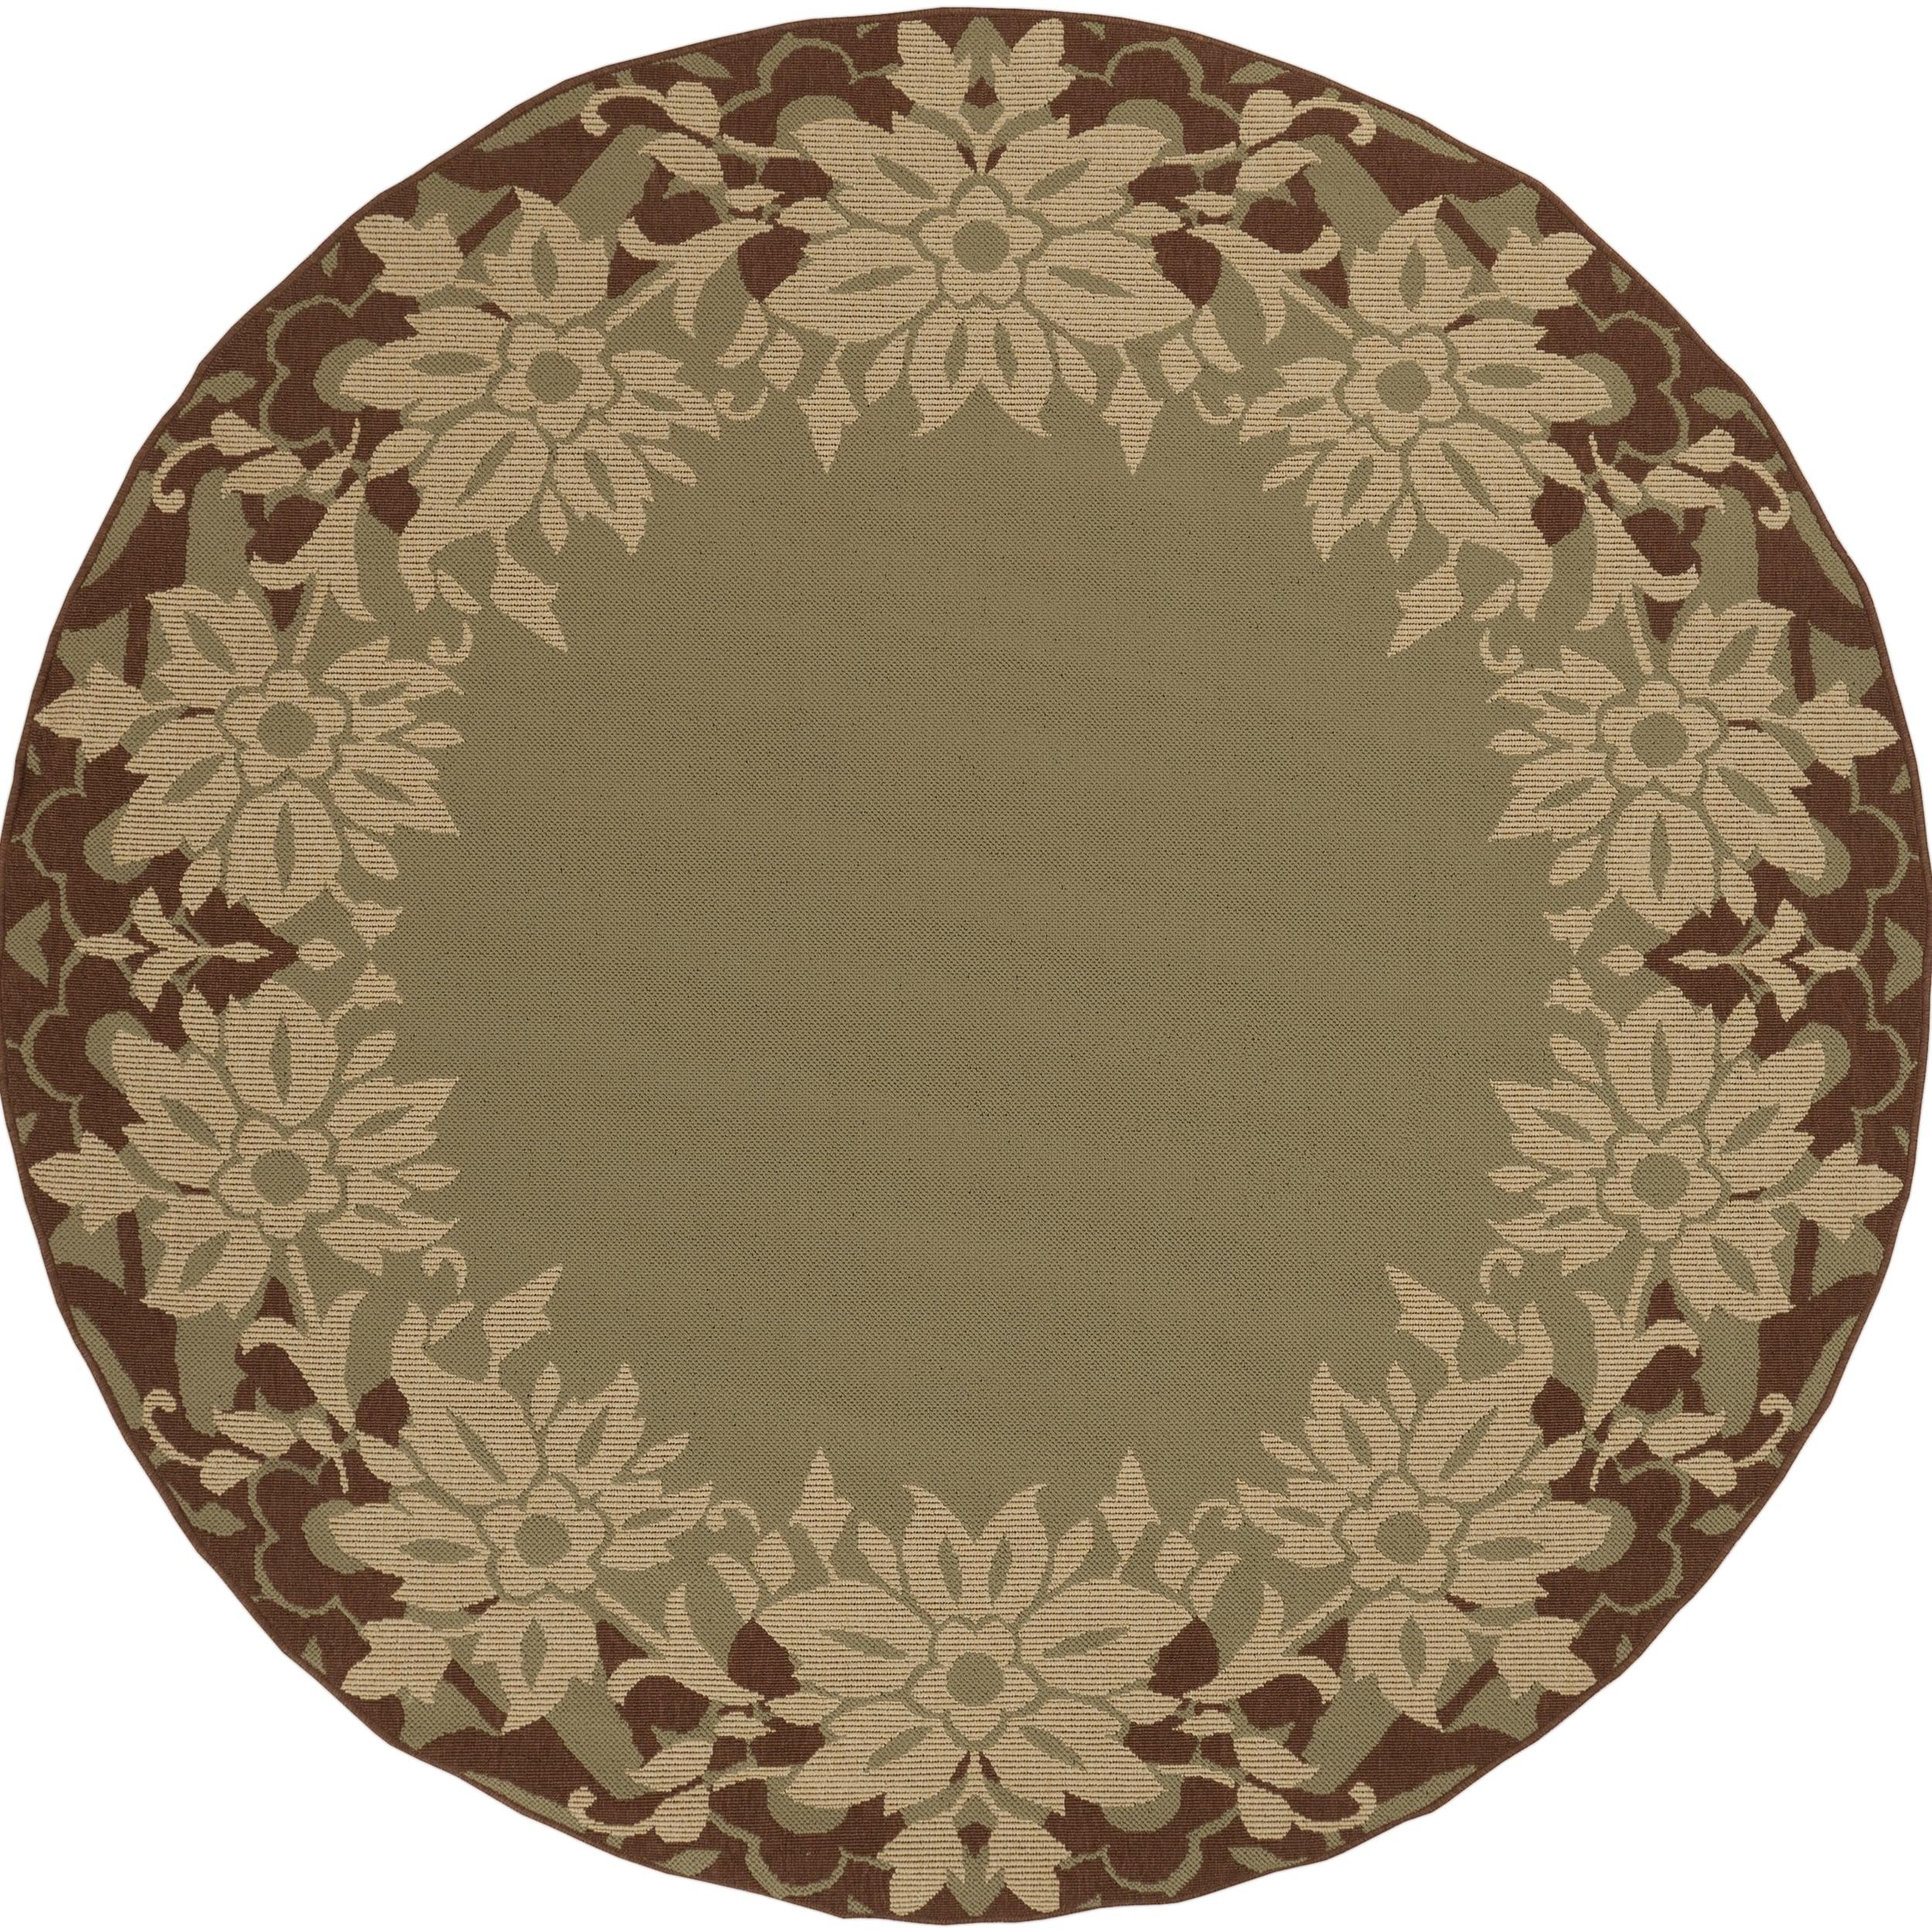 Antimary Russet Floral Border Indoor/Outdoor Rug (8'3 x 7'3)